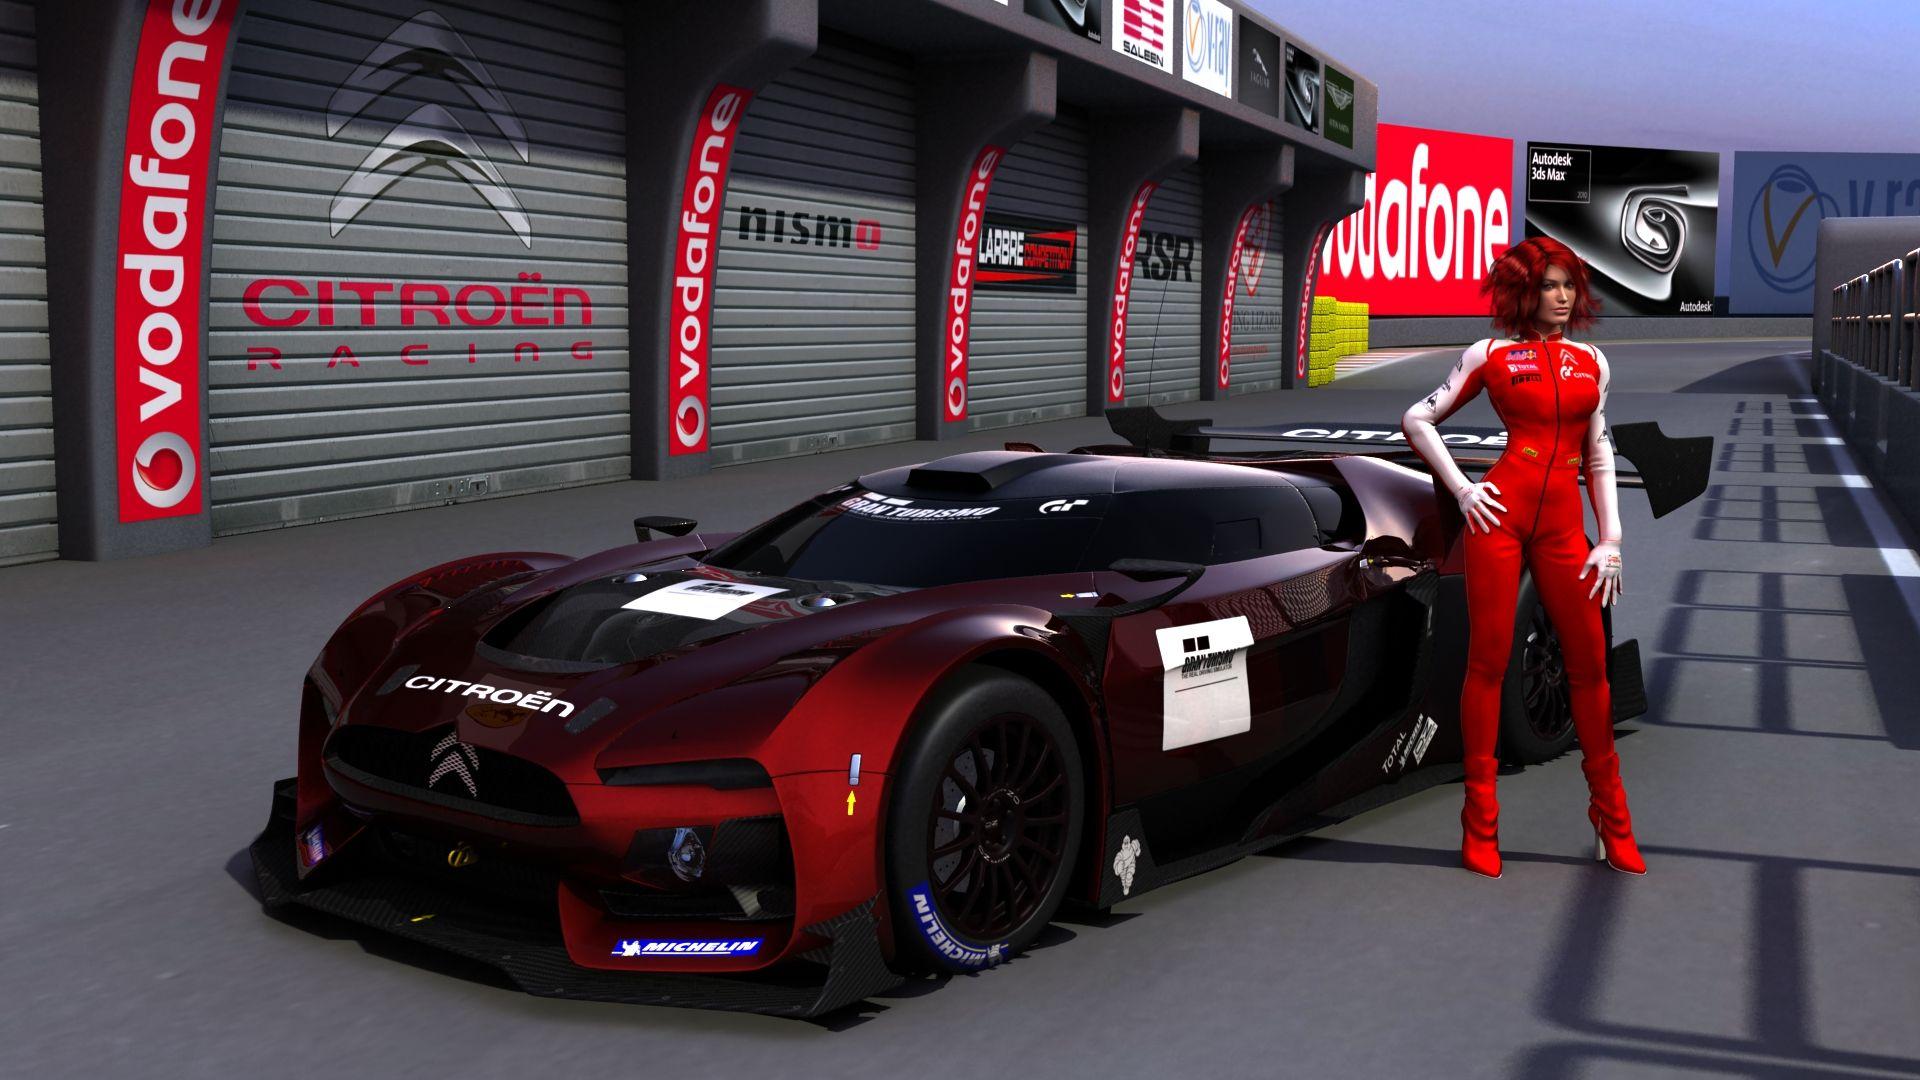 Concept Citroen Citroen Racing Pinterest Cars Race Cars And Art